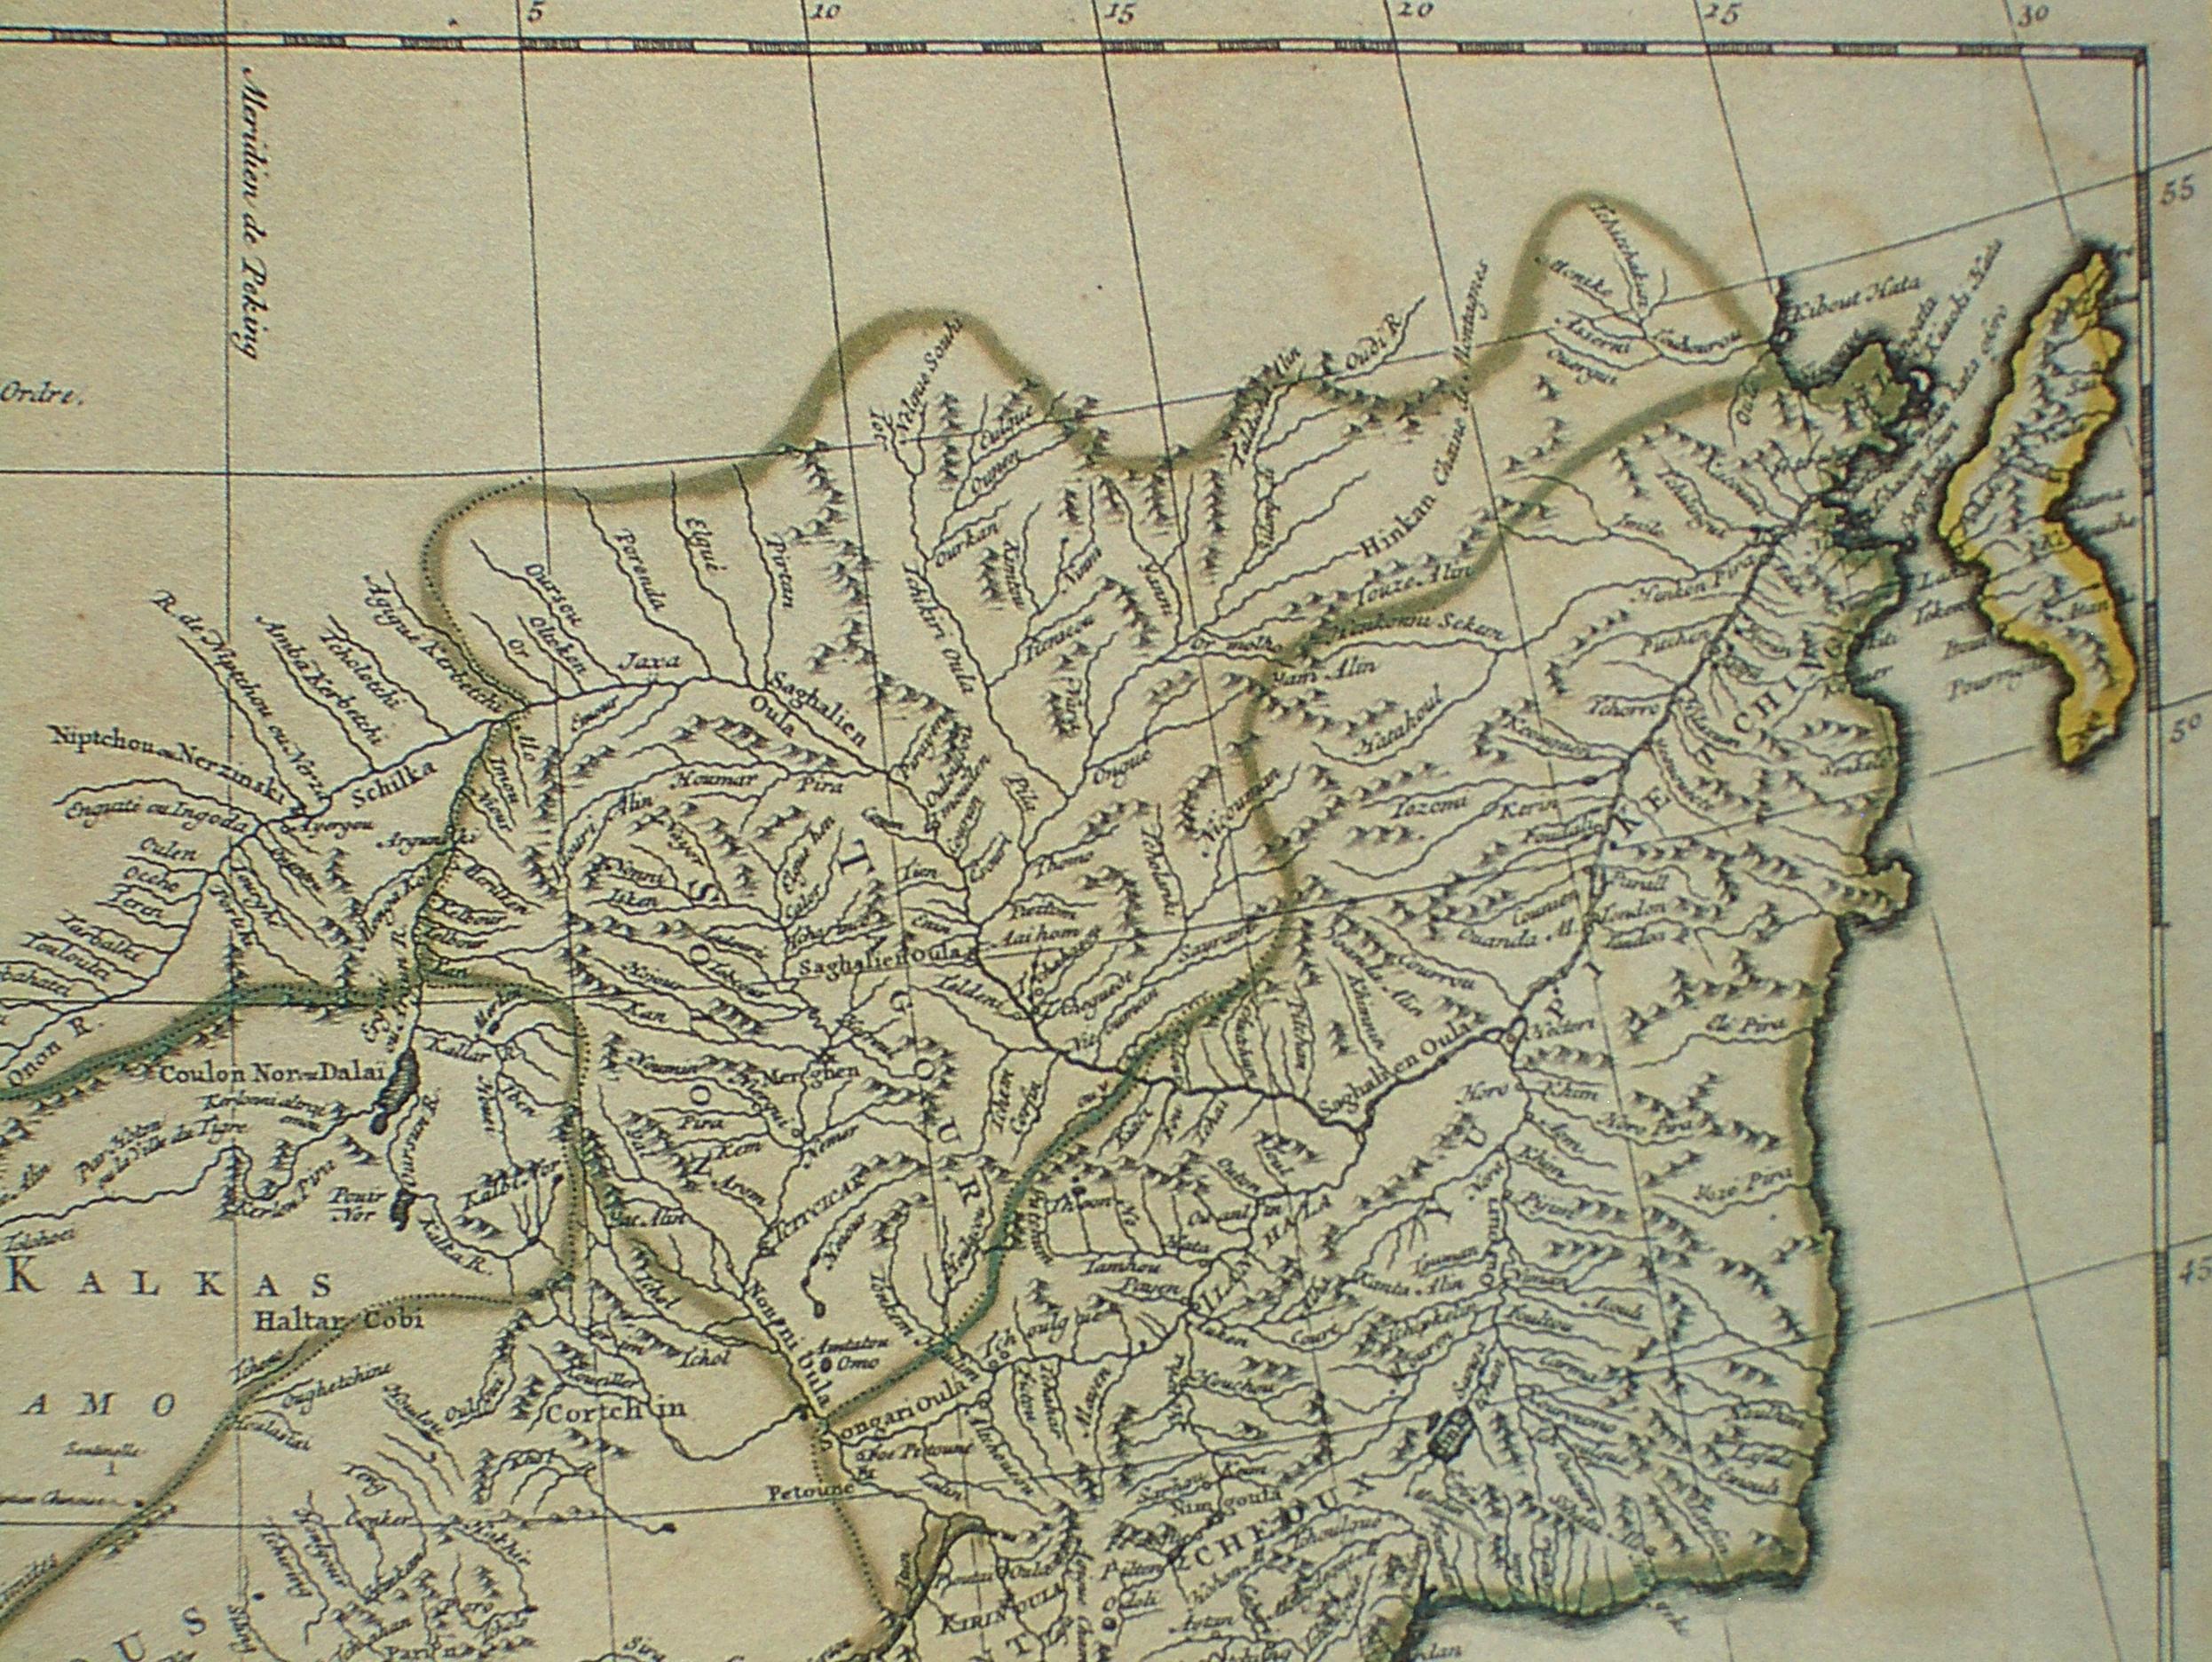 https://upload.wikimedia.org/wikipedia/commons/6/63/CEM-44-La-Chine-la-Tartarie-Chinoise-et-le-Thibet-1734-Amur-2572.jpg